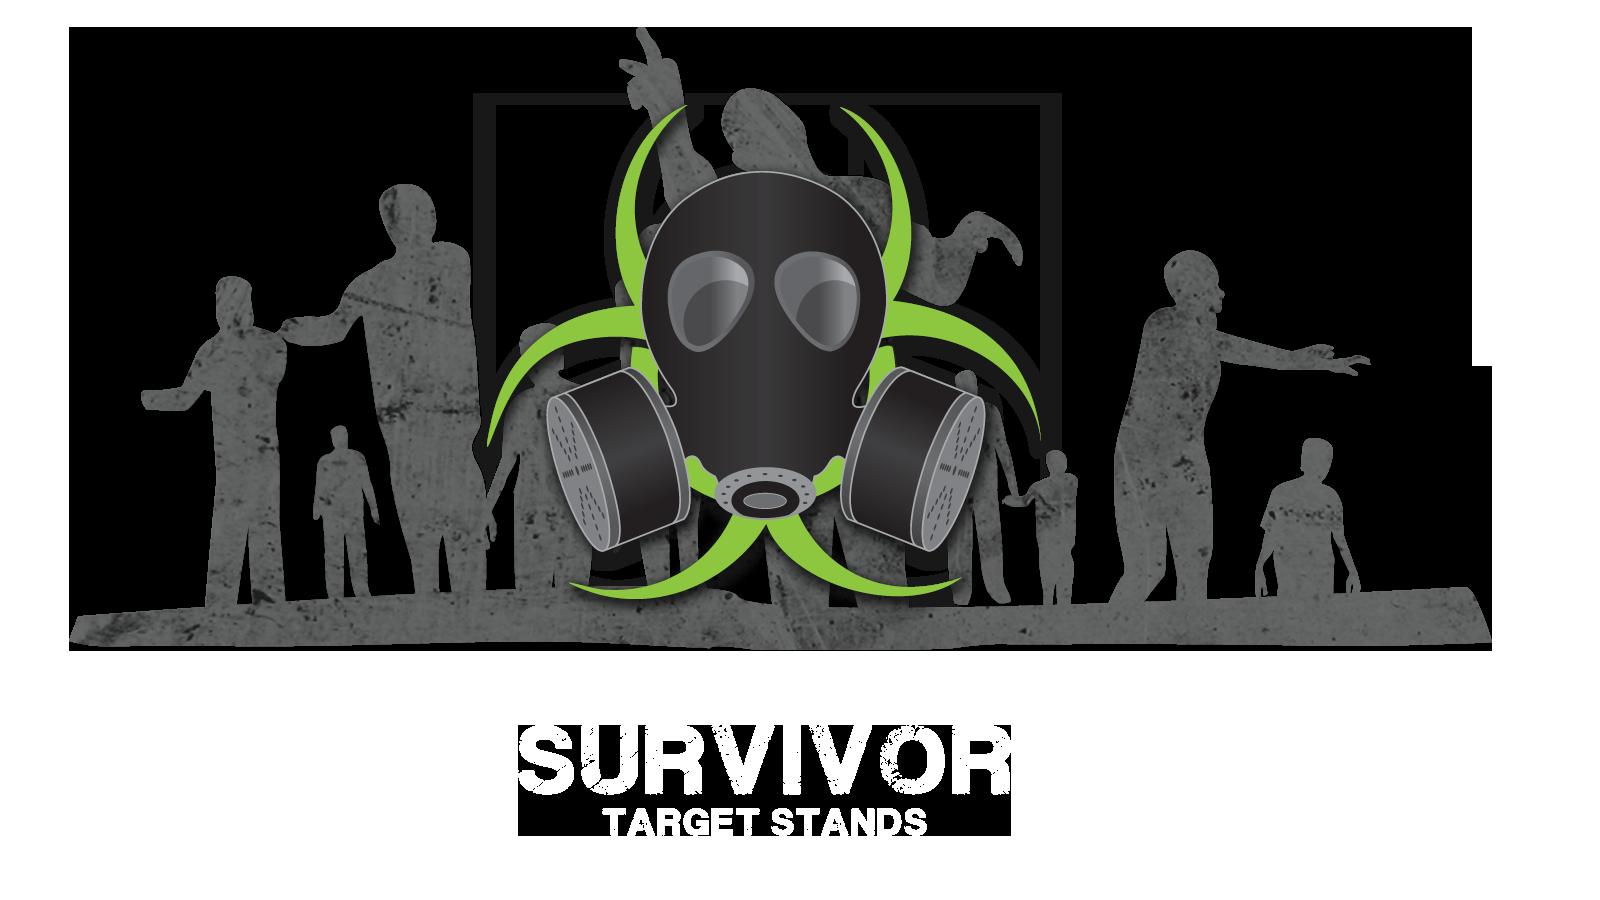 Survivor Target Stands